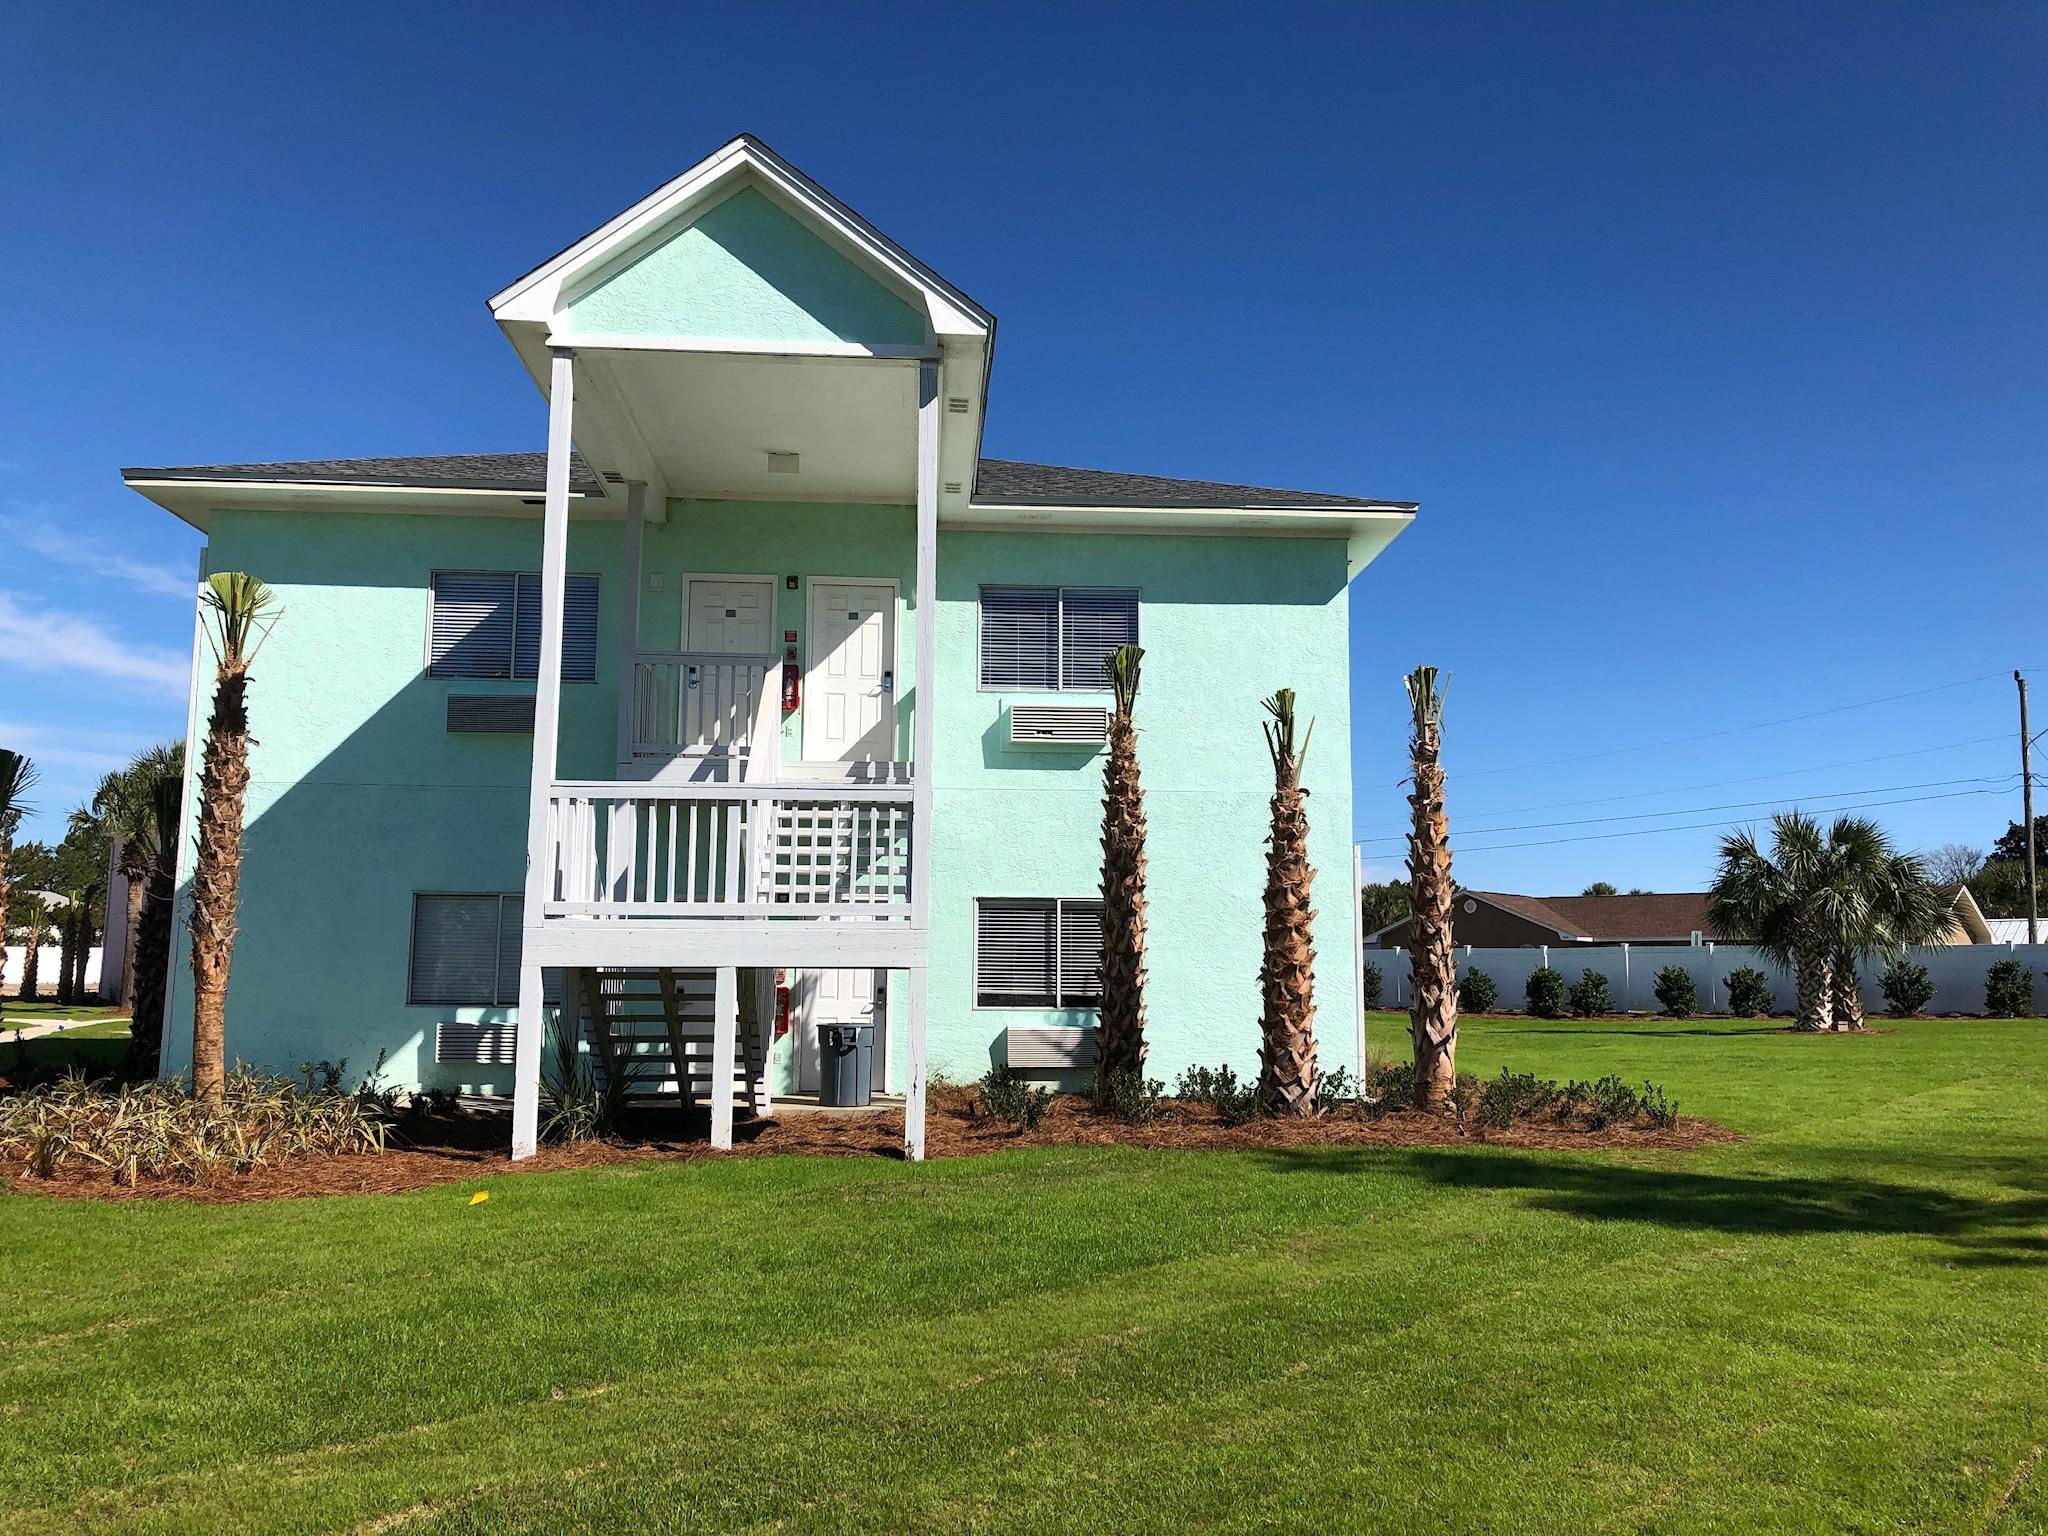 Shalimar Retreat At By The Sea Resorts Panama City Beach Hotels